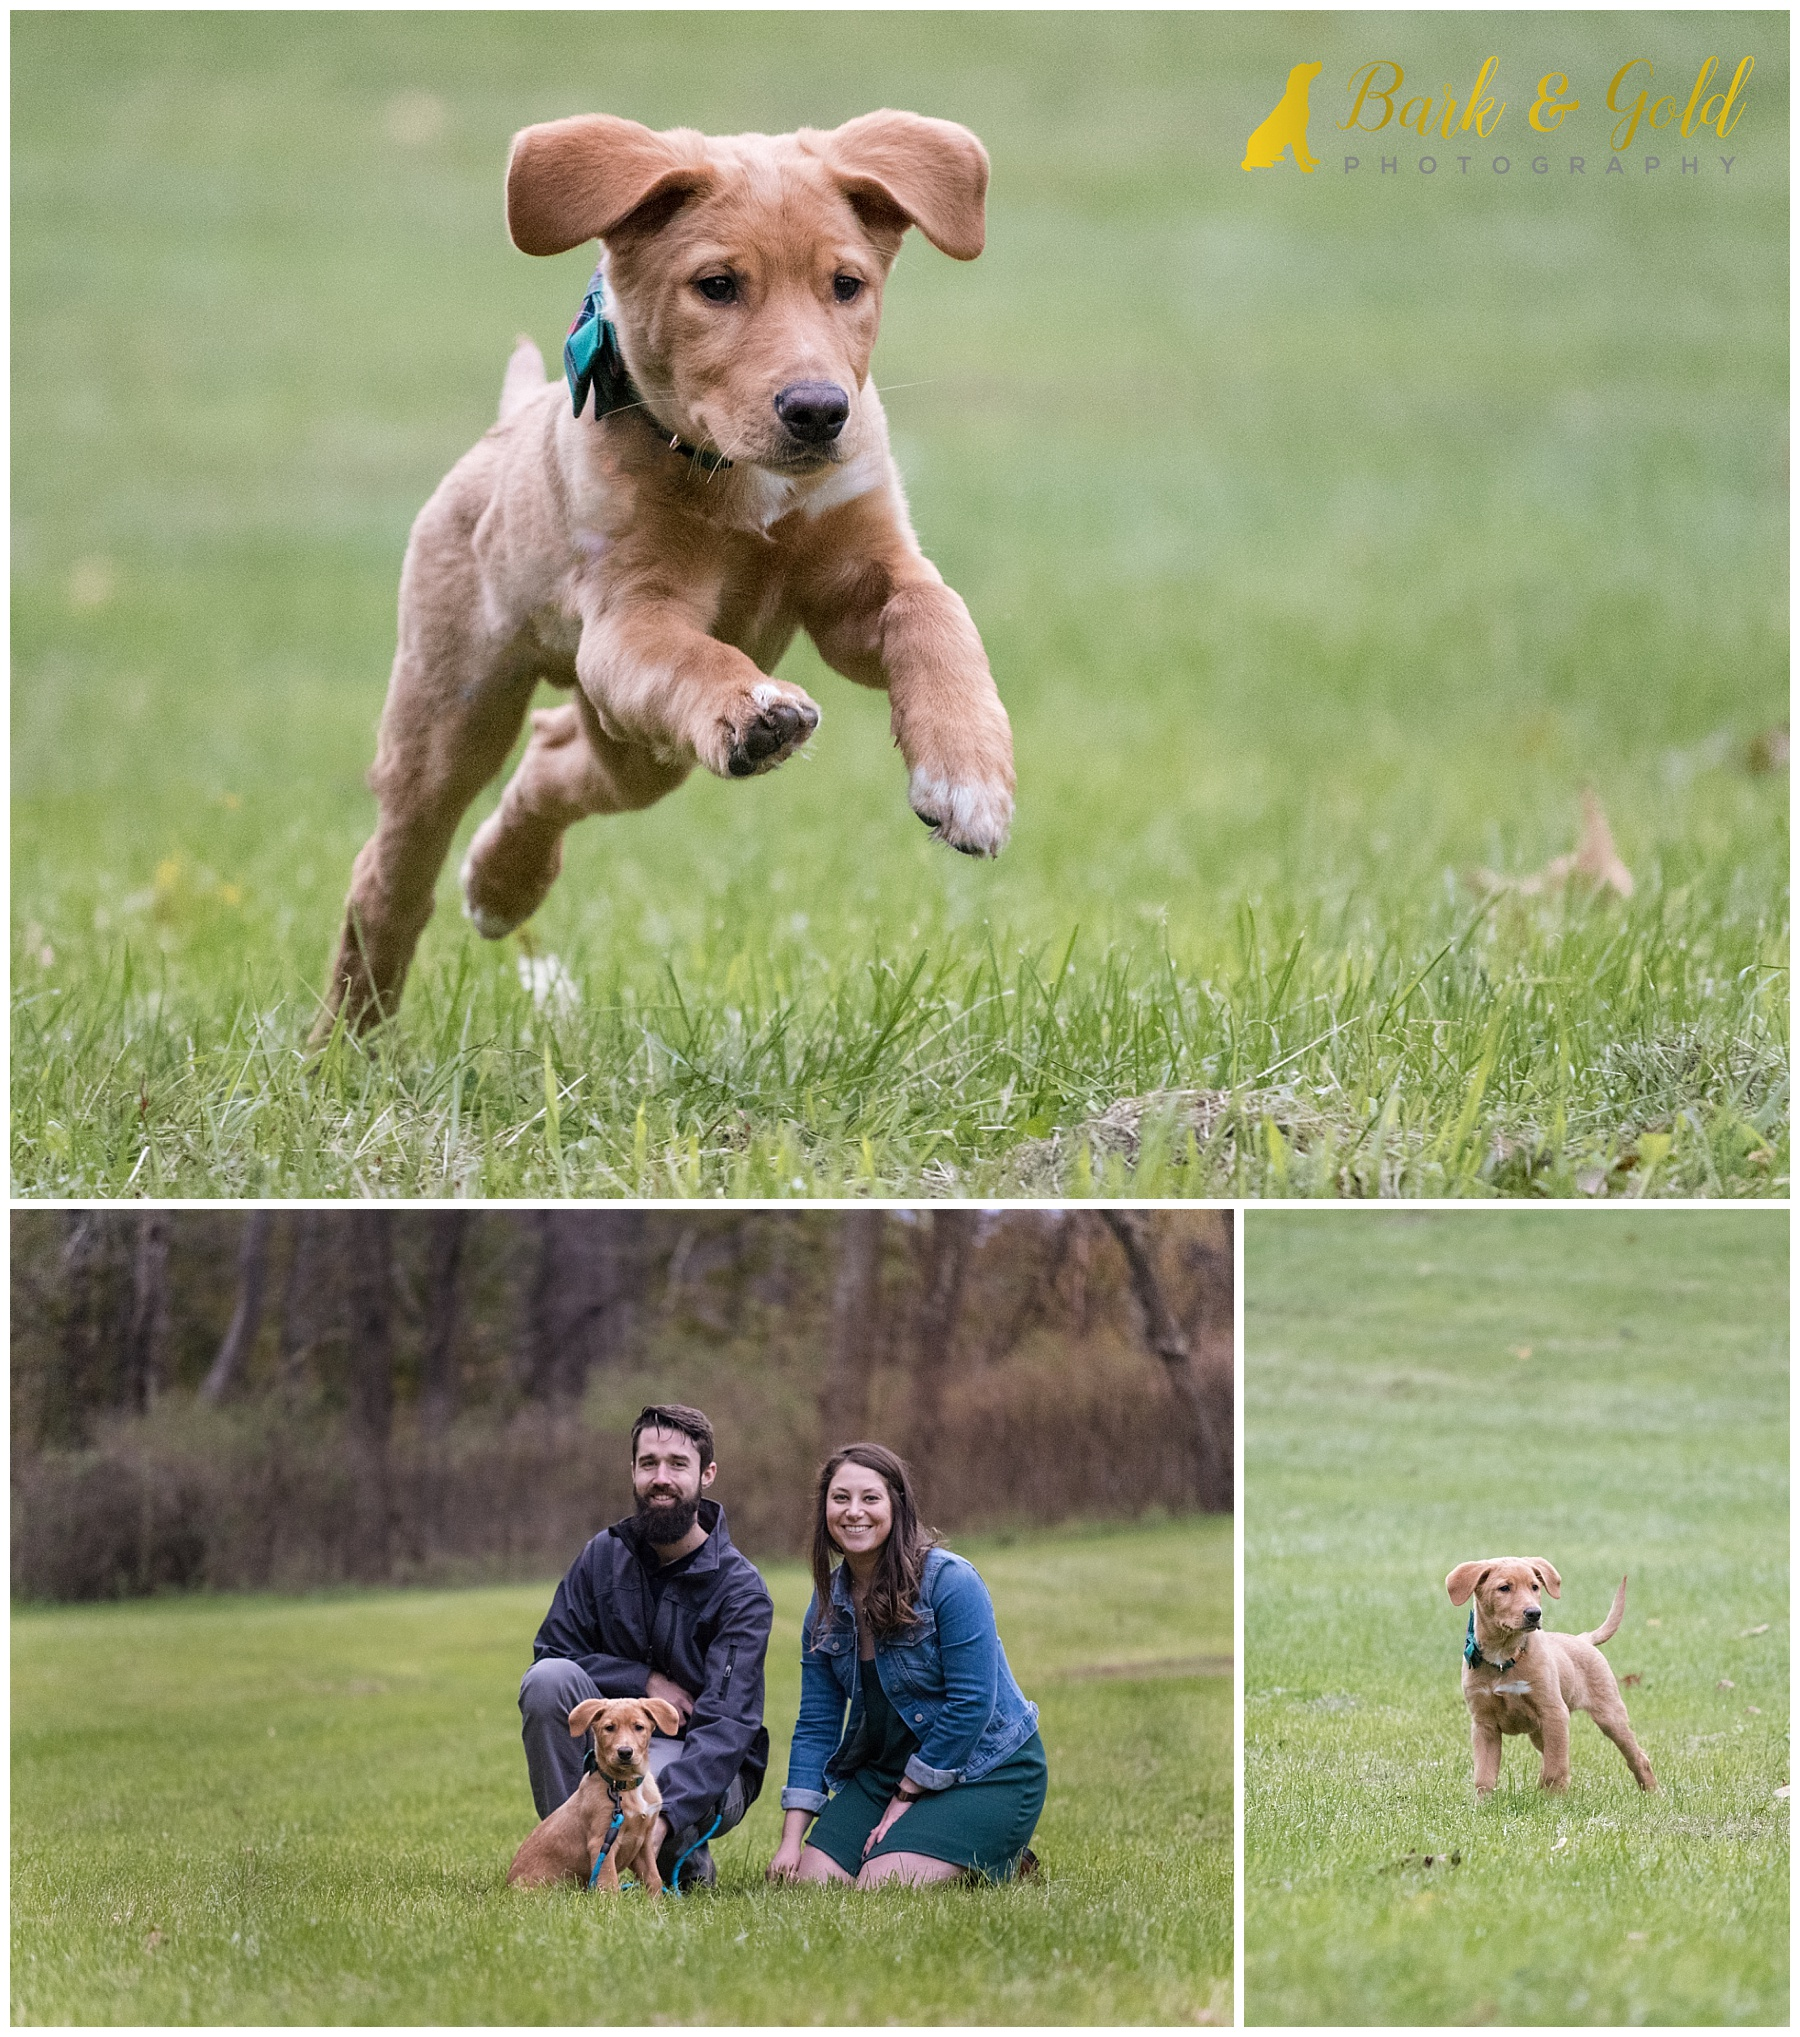 Brown puppy at Mingo Creek Park running through a field